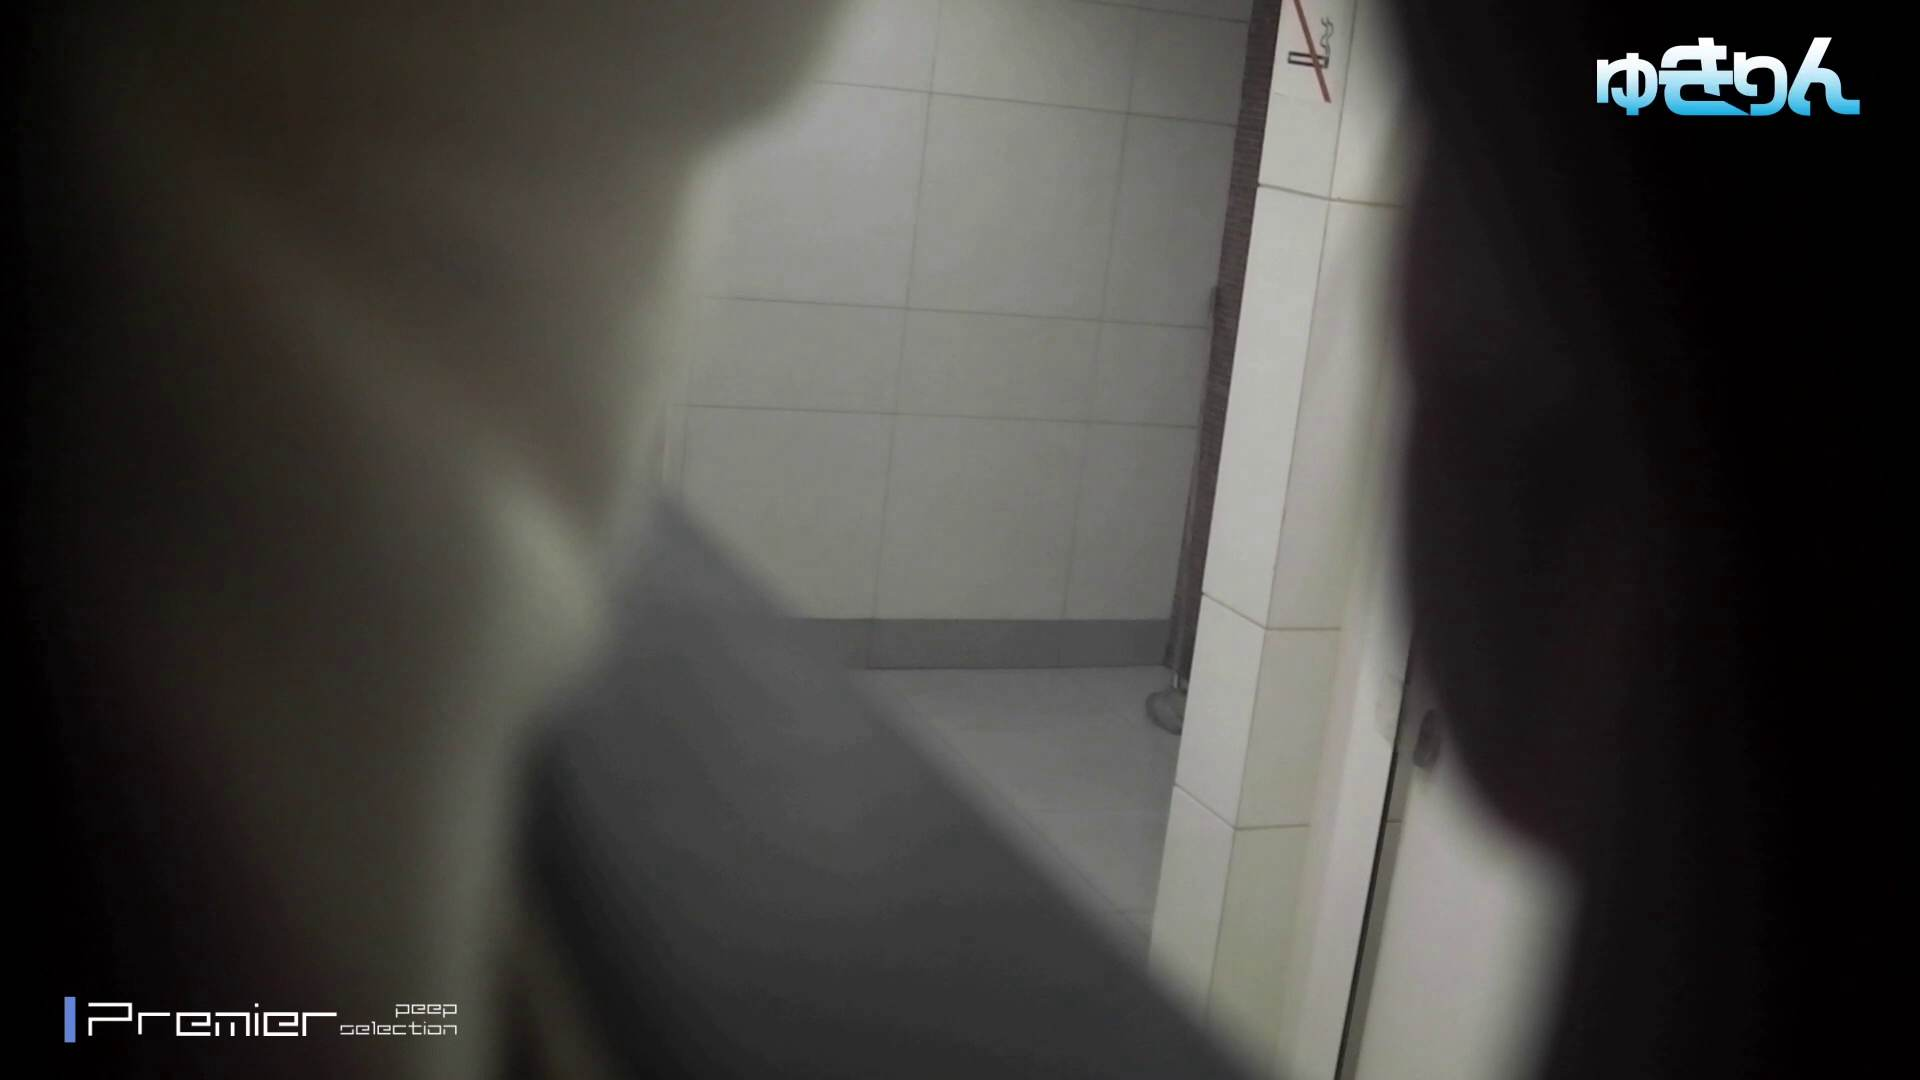 cm友達同士三人グループの二人を同時に捕獲【新世界の射窓からNo120】 丸見え AV動画キャプチャ 92画像 24